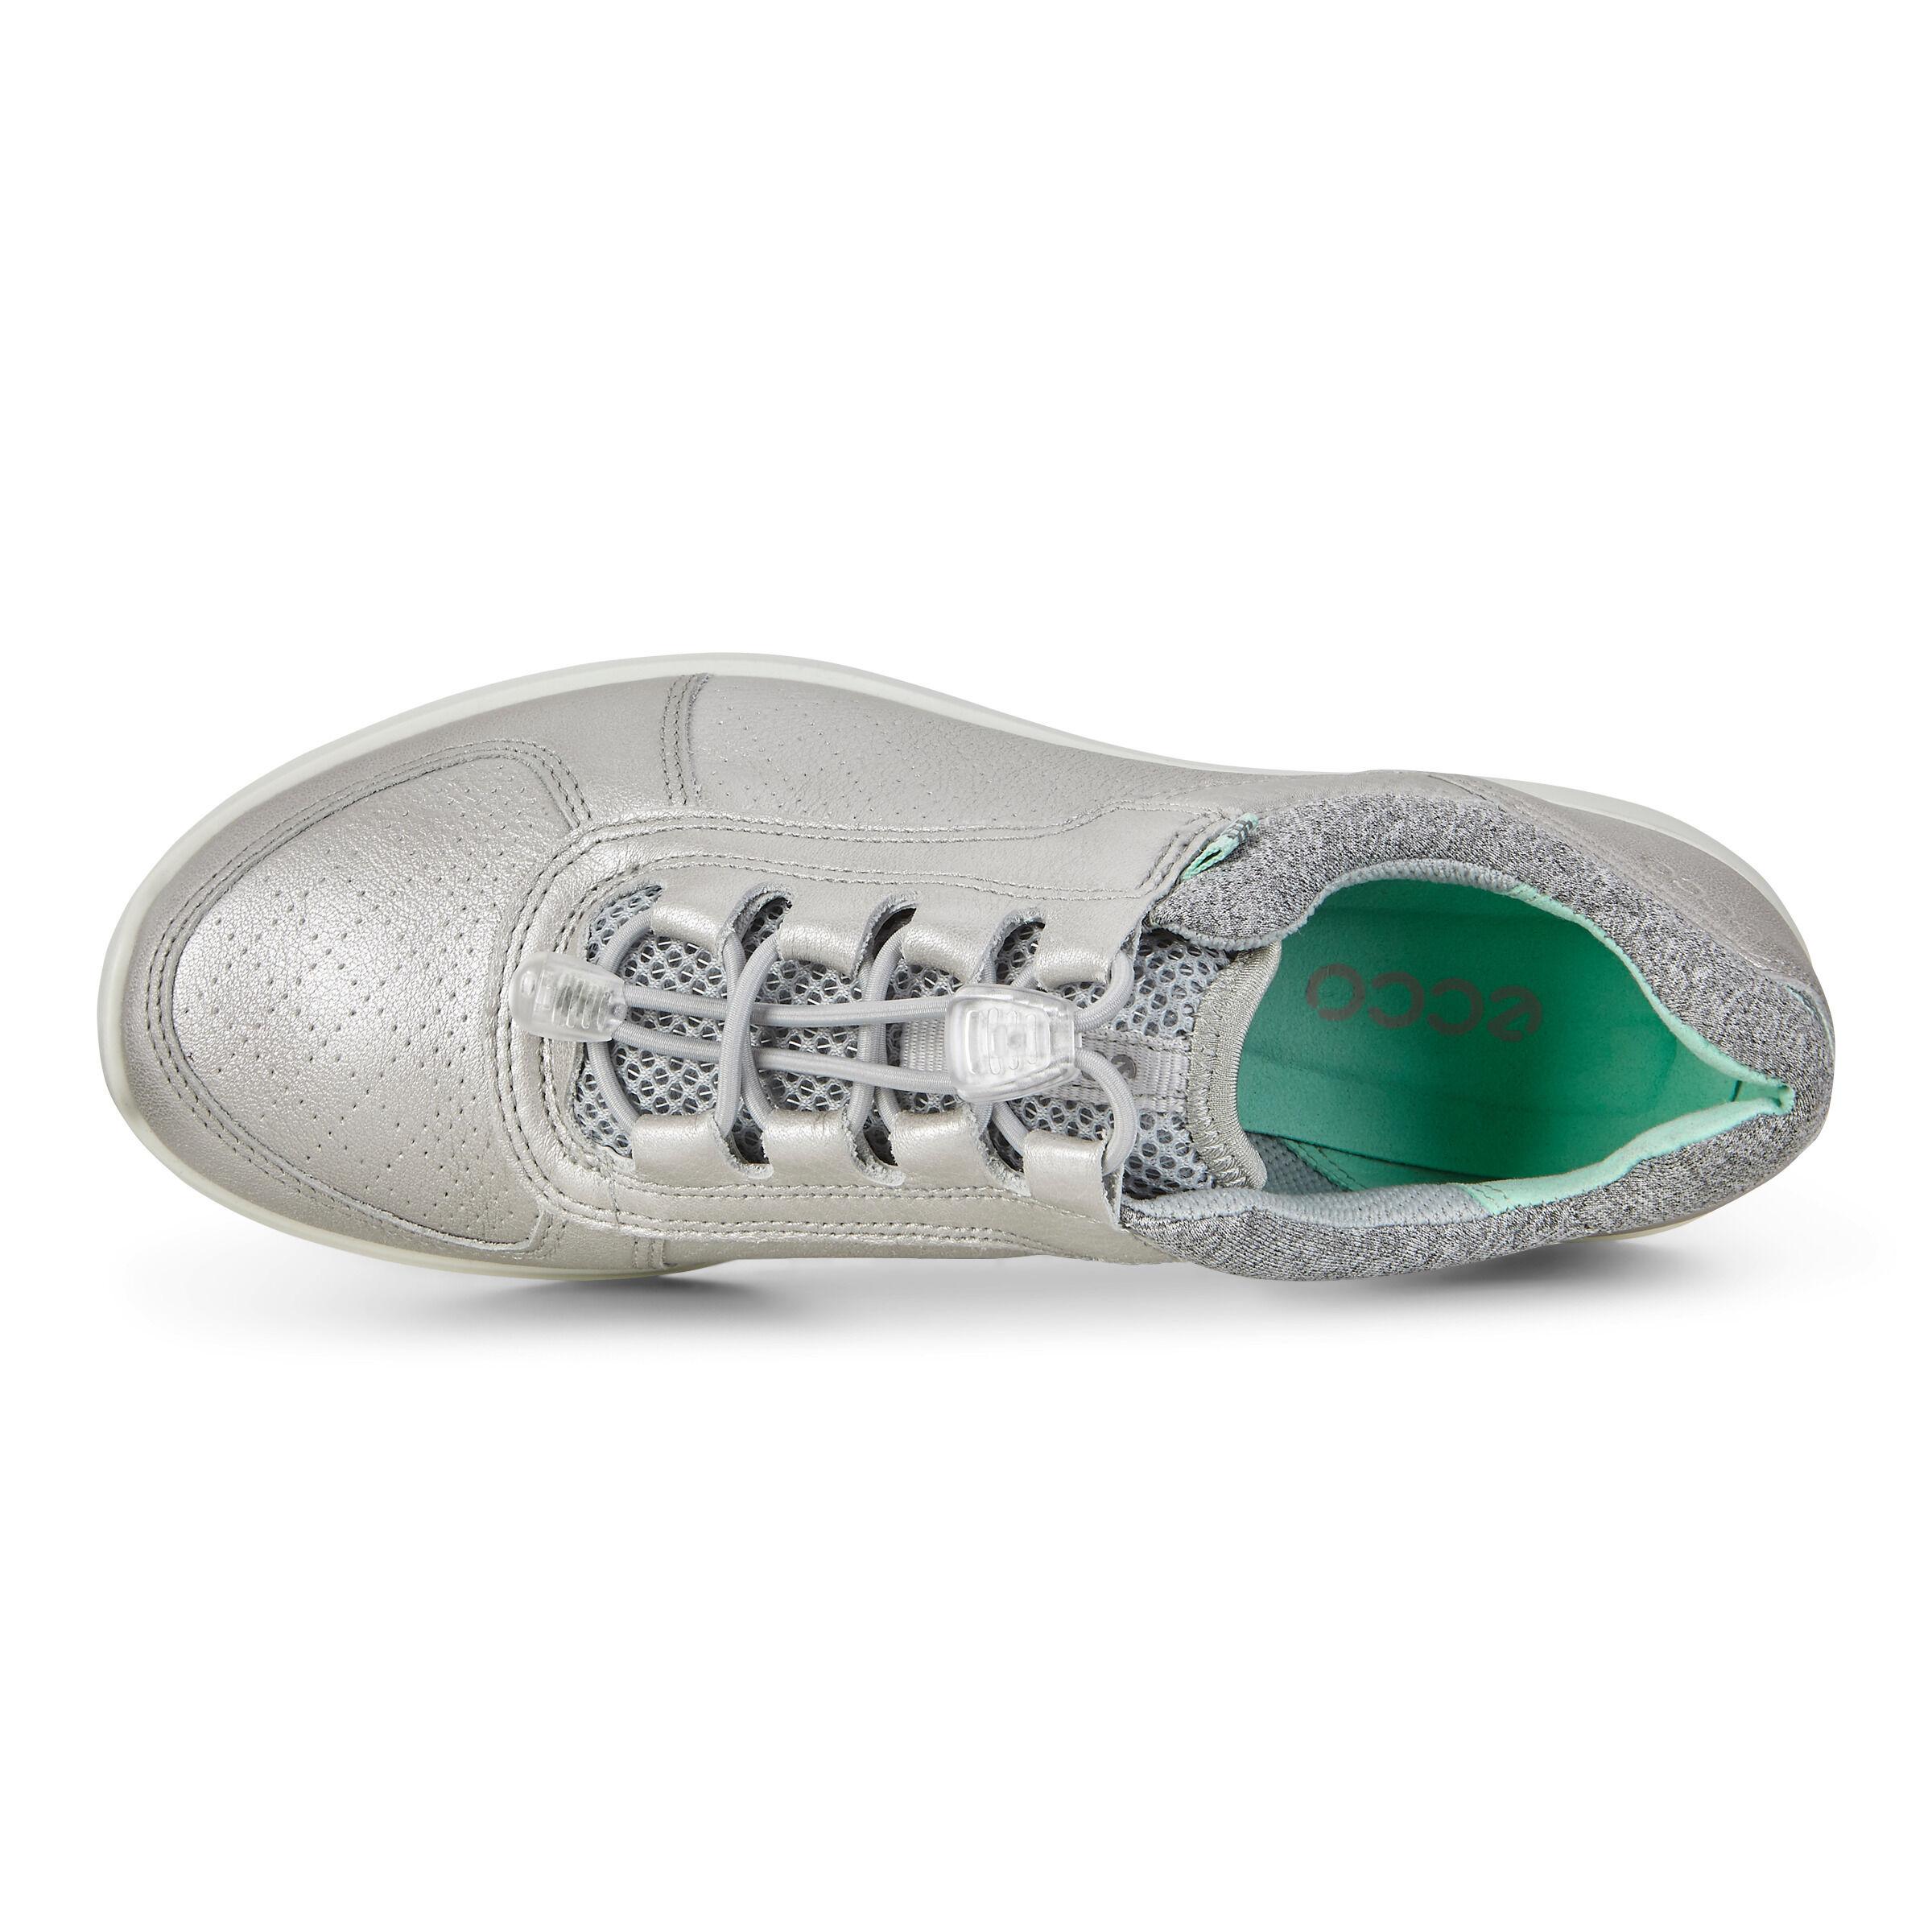 ECCO Women's Sense Toggle   Casual Shoes   ECCO® Shoes